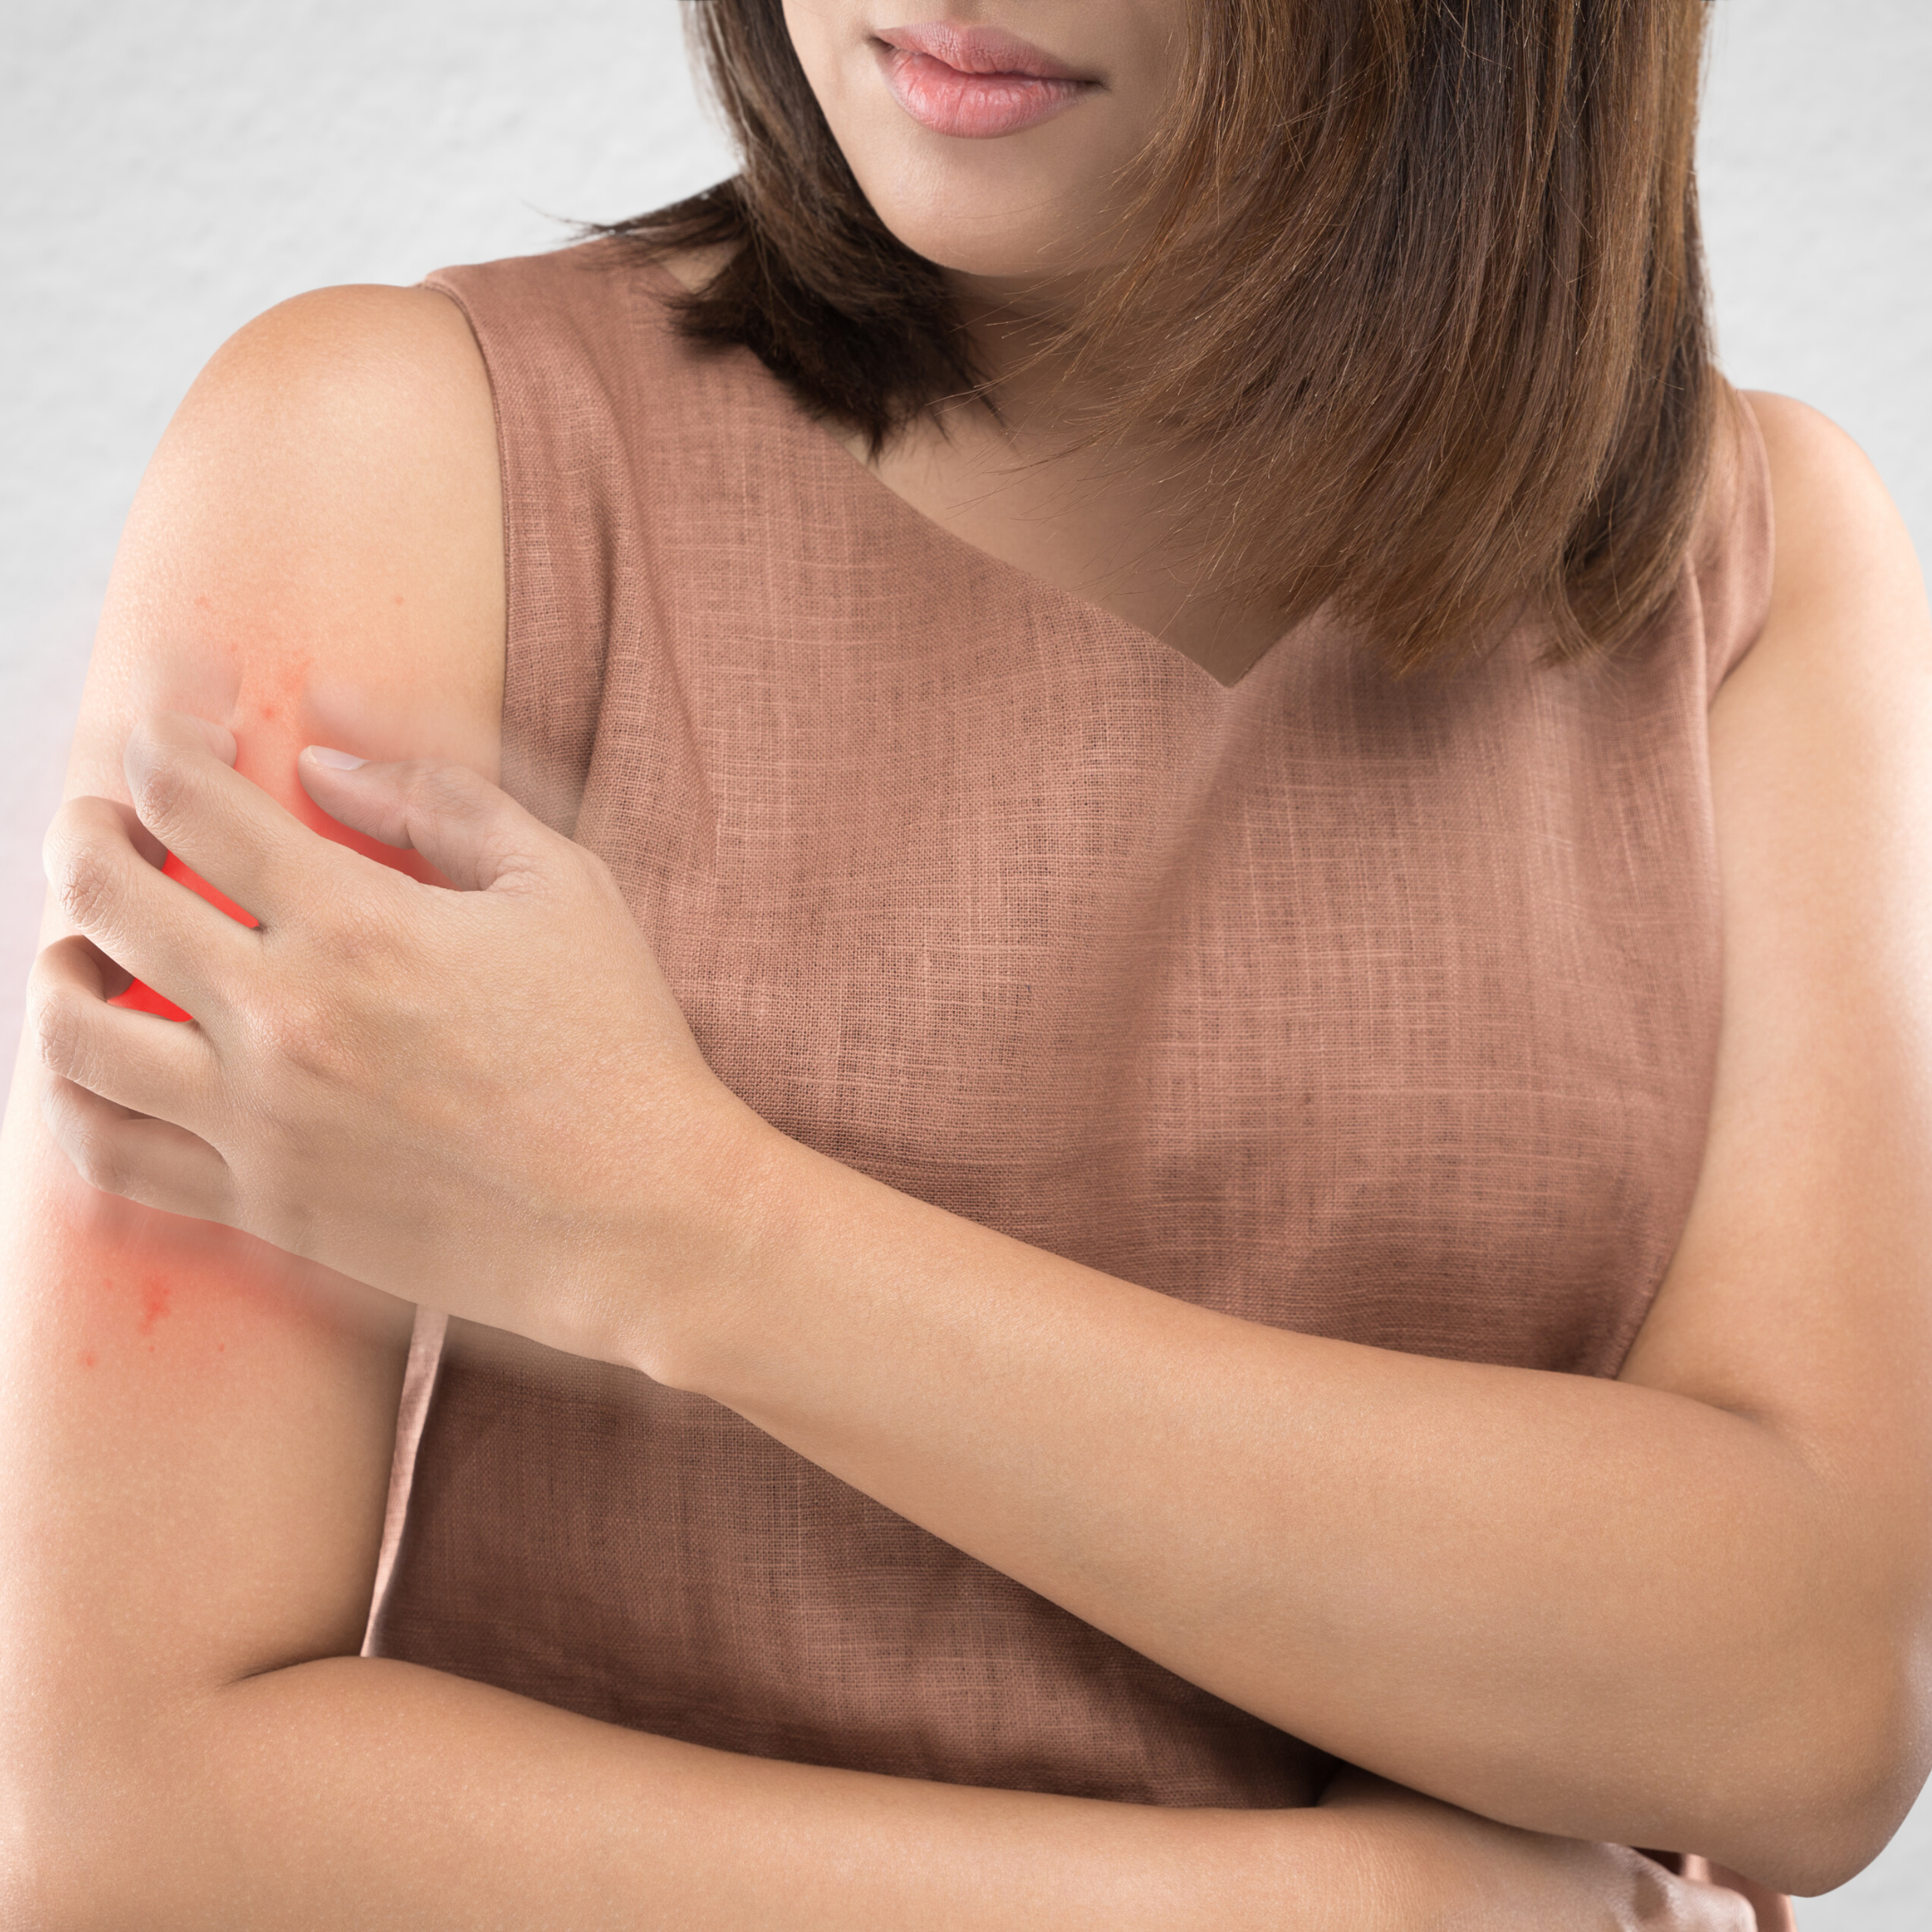 Conheça a dermatite herpetiforme